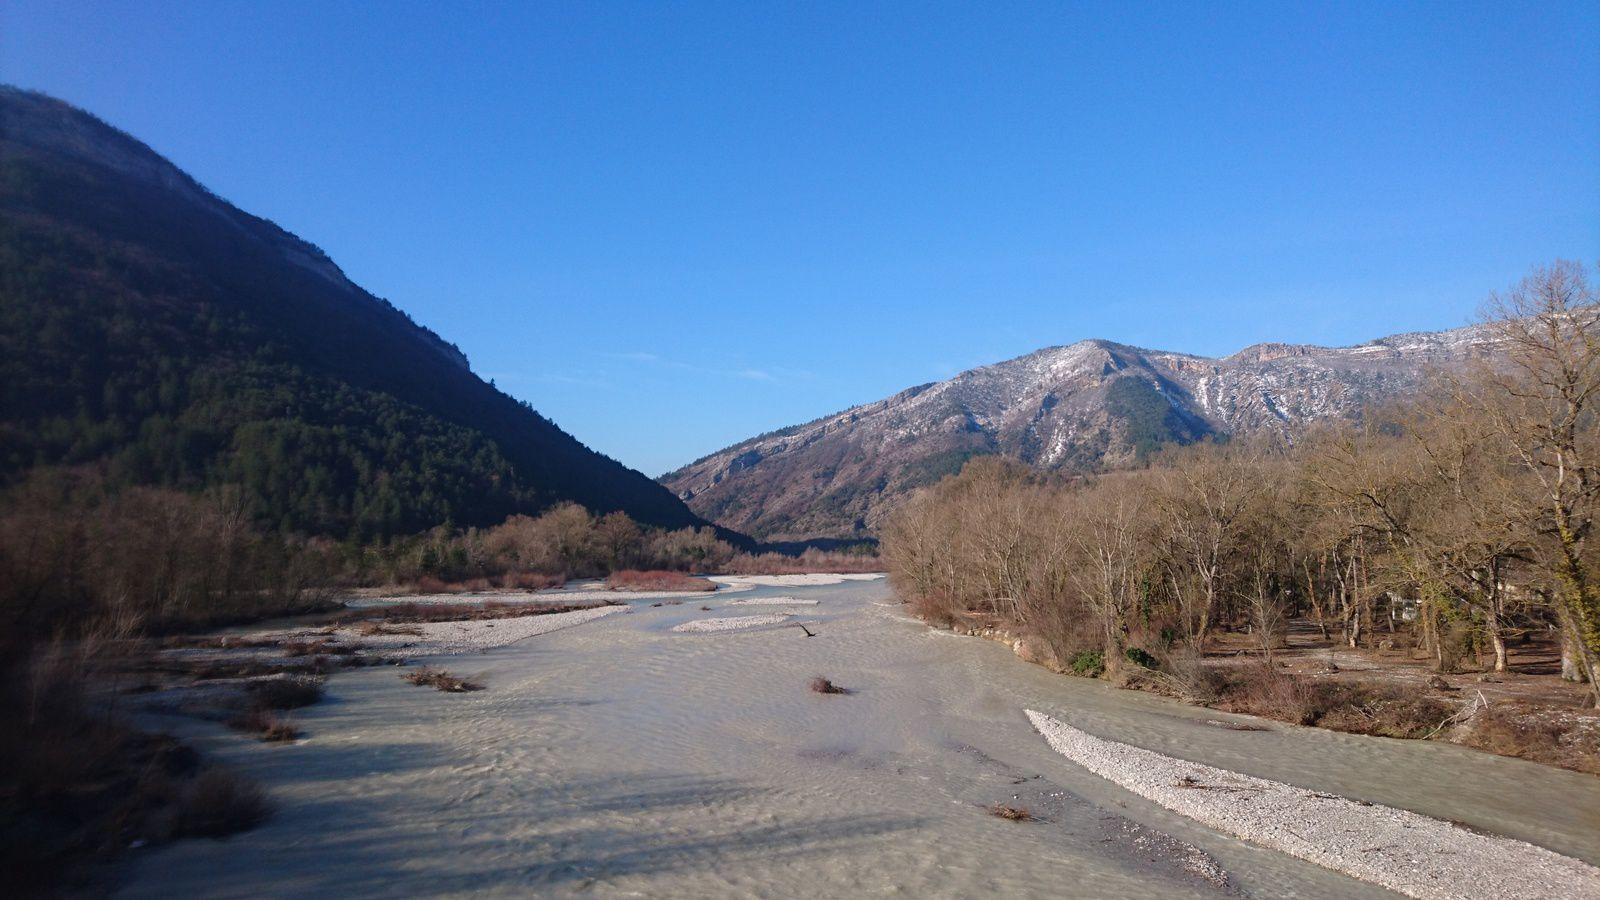 La Drôme à Vercheny, en aval du pont.